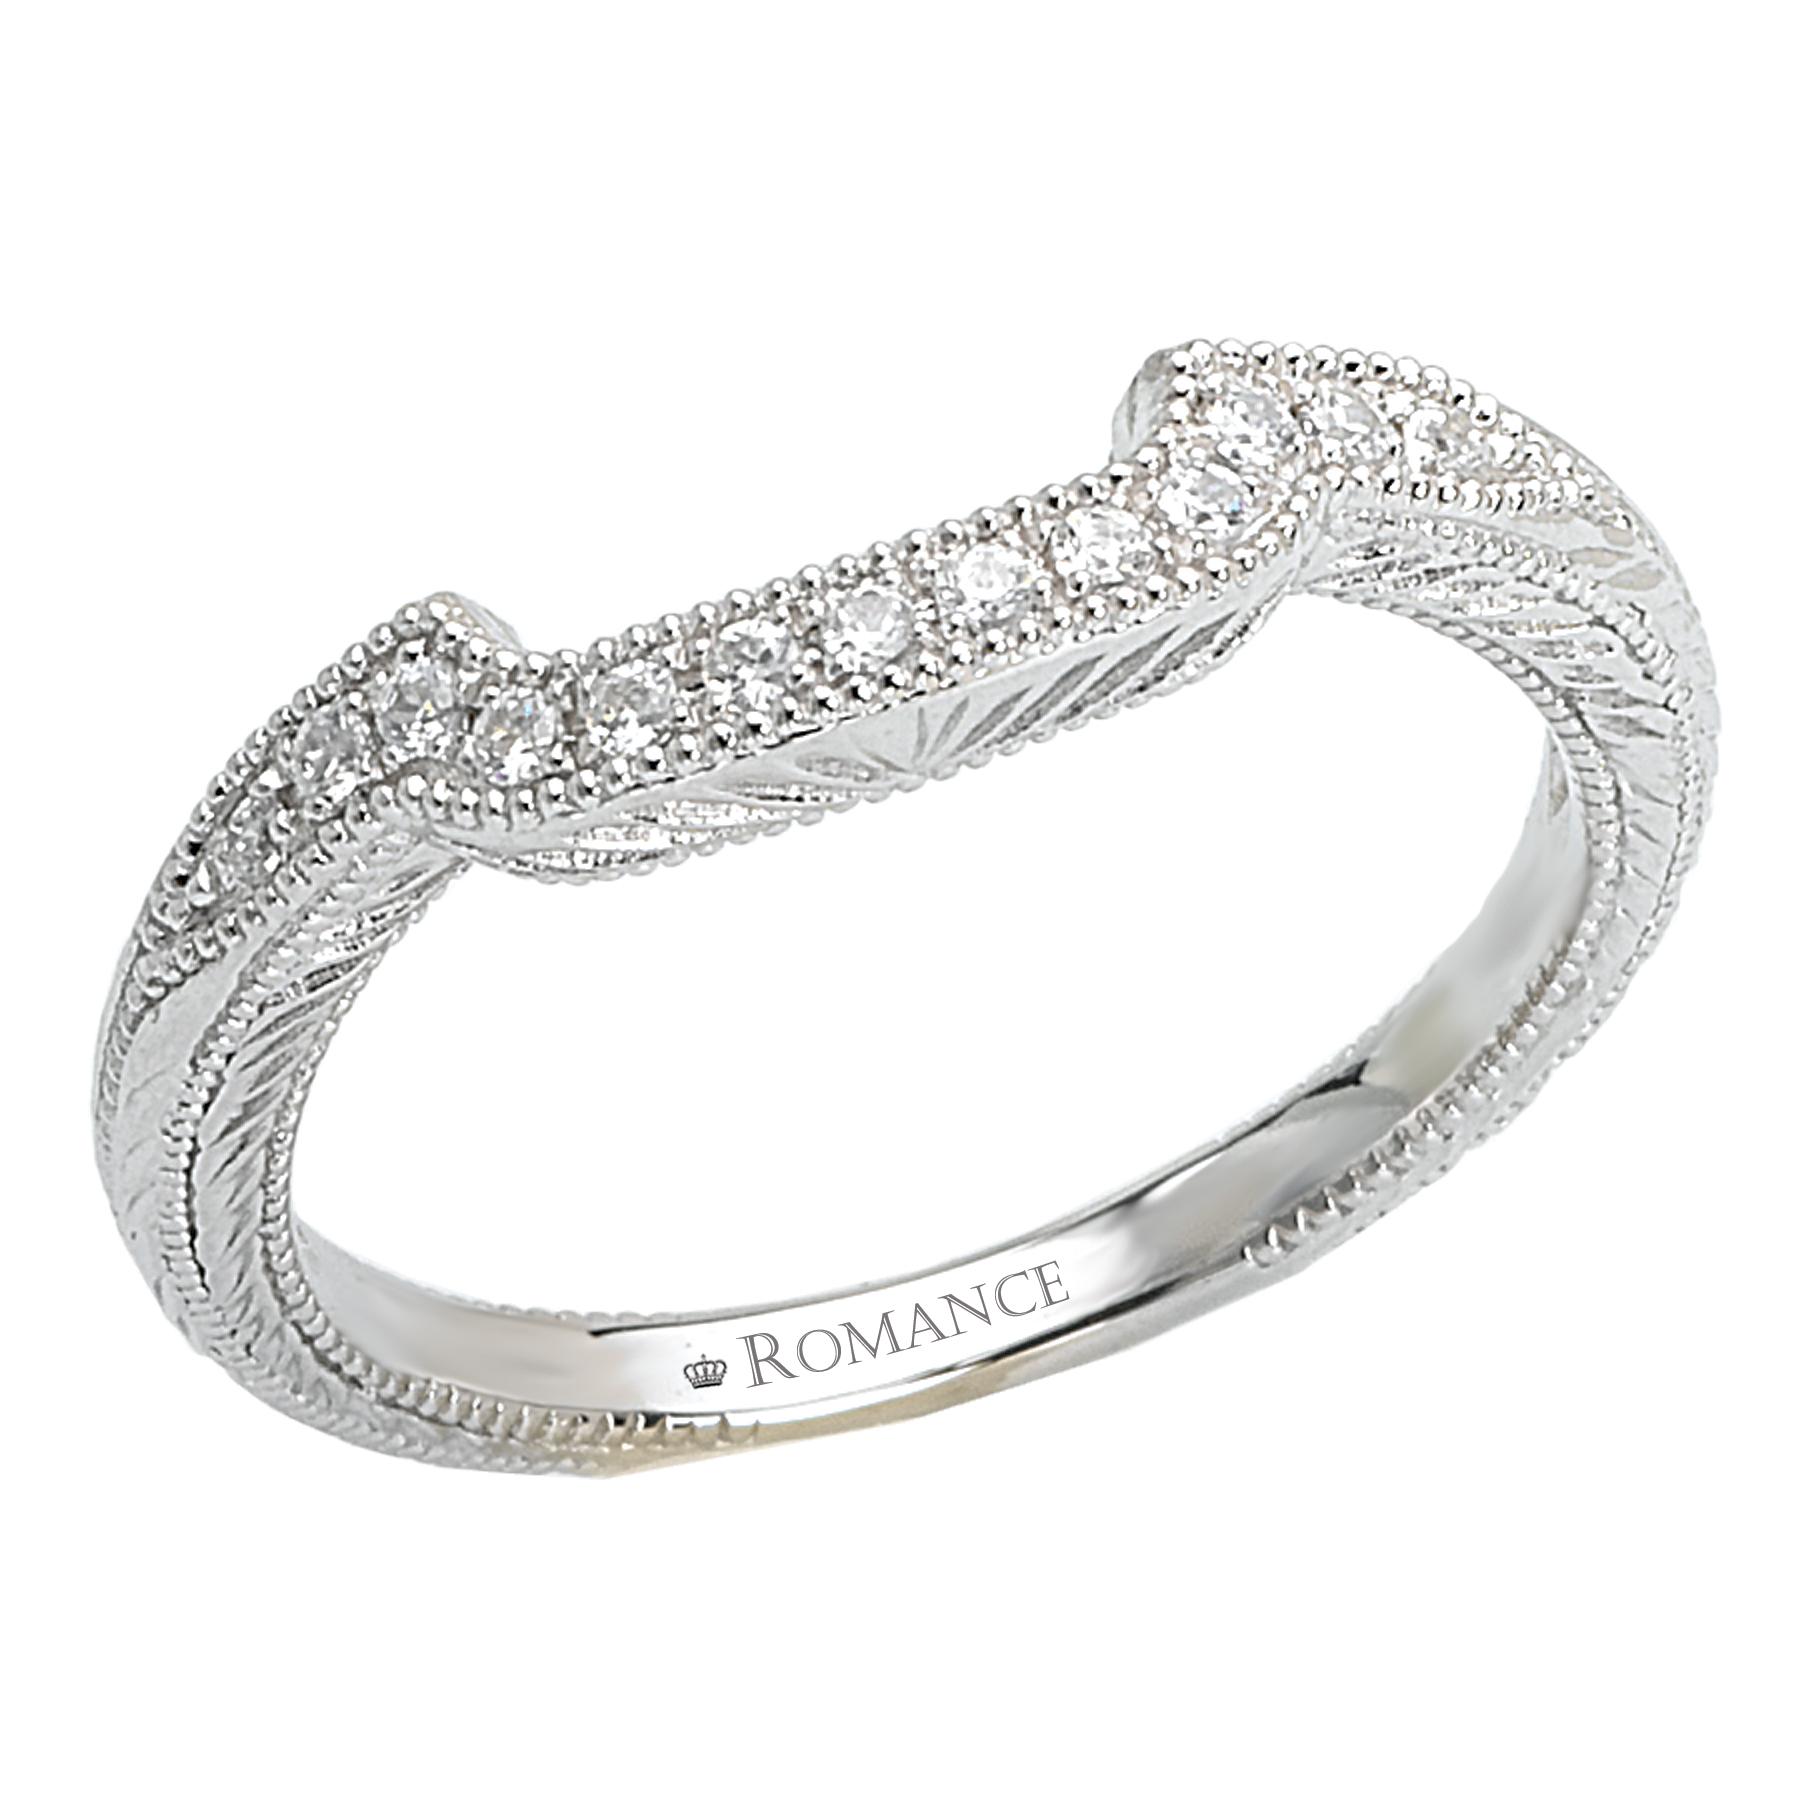 Romance Wedding Bands 118186-W product image